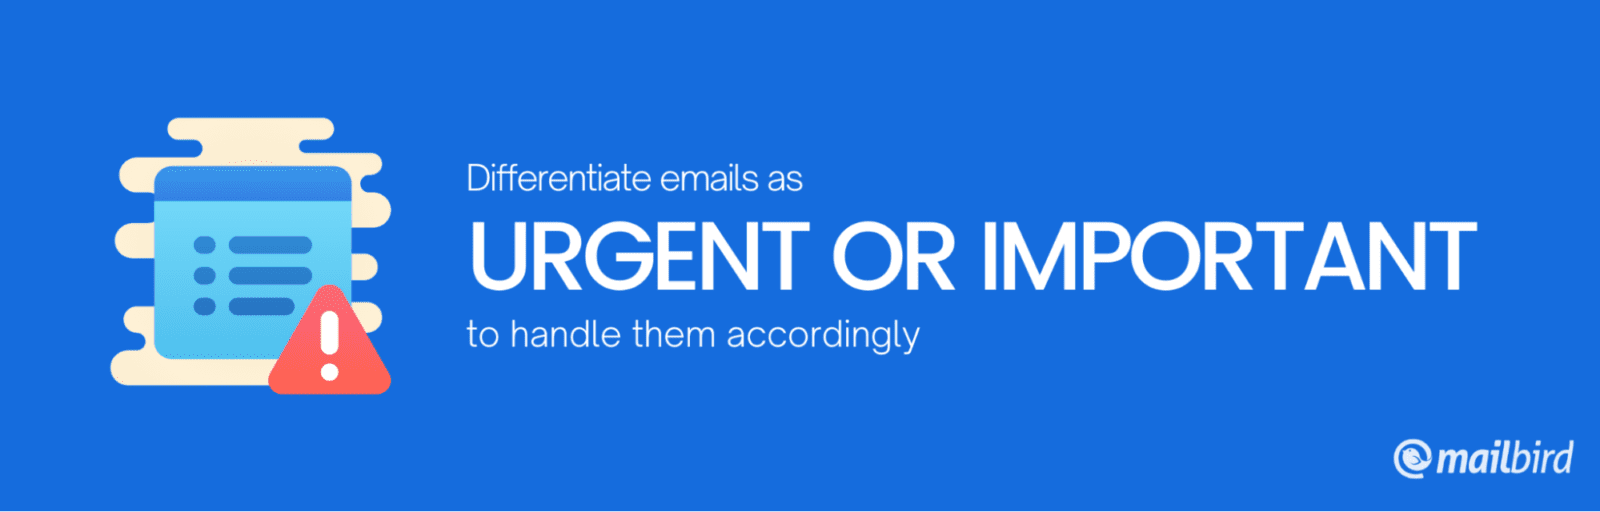 prioritize important emails